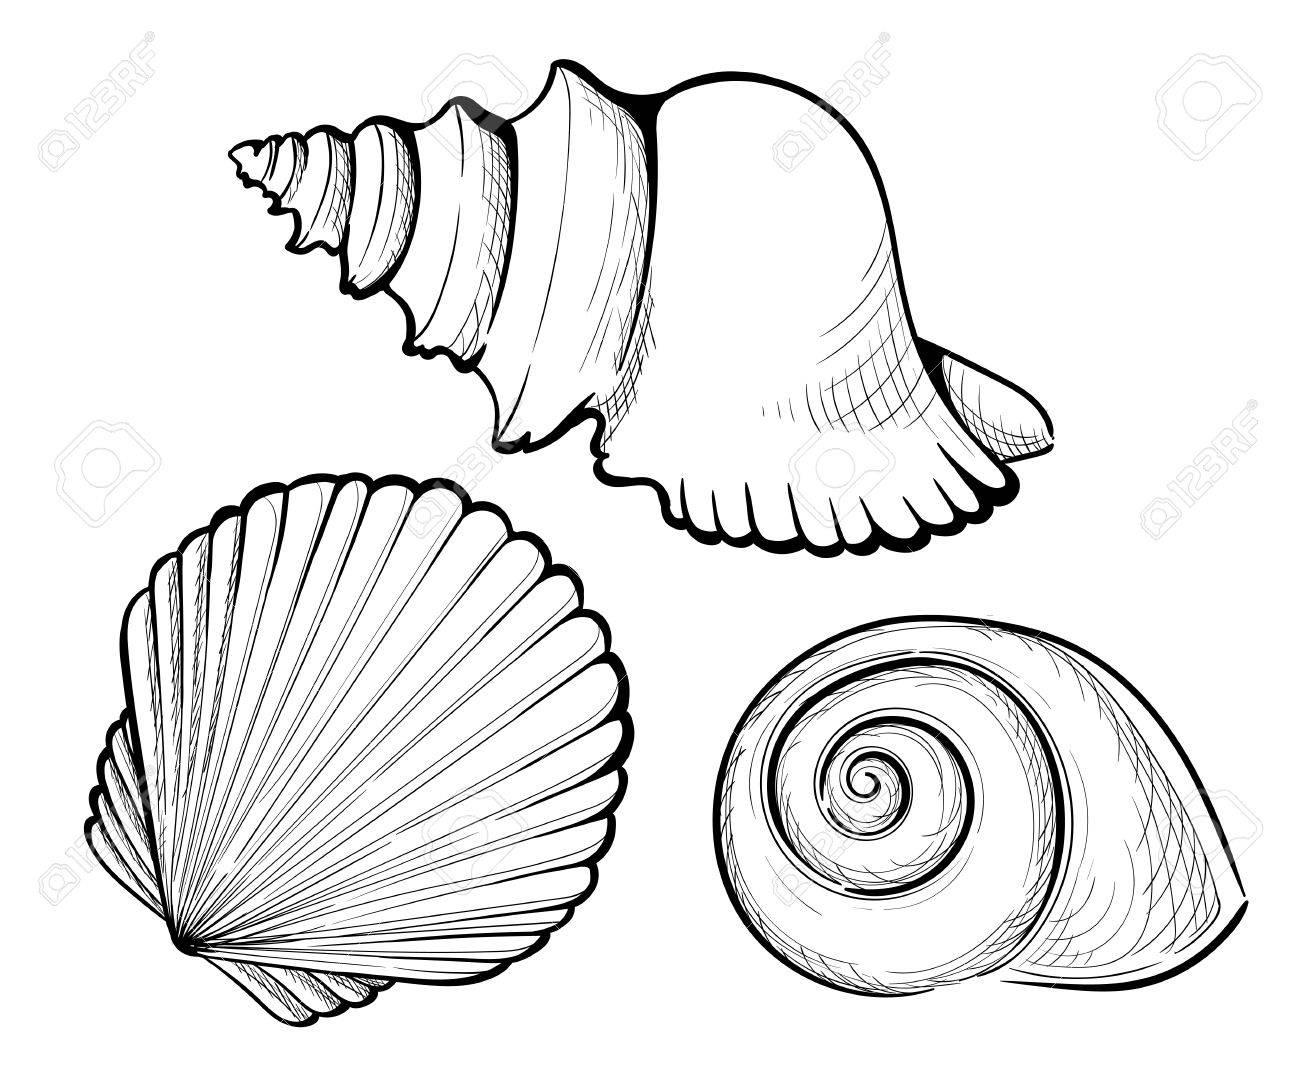 1300x1083 Hand Draw Set Sea Shell, Coral, Crab, Shrimp And Octopus. Vector